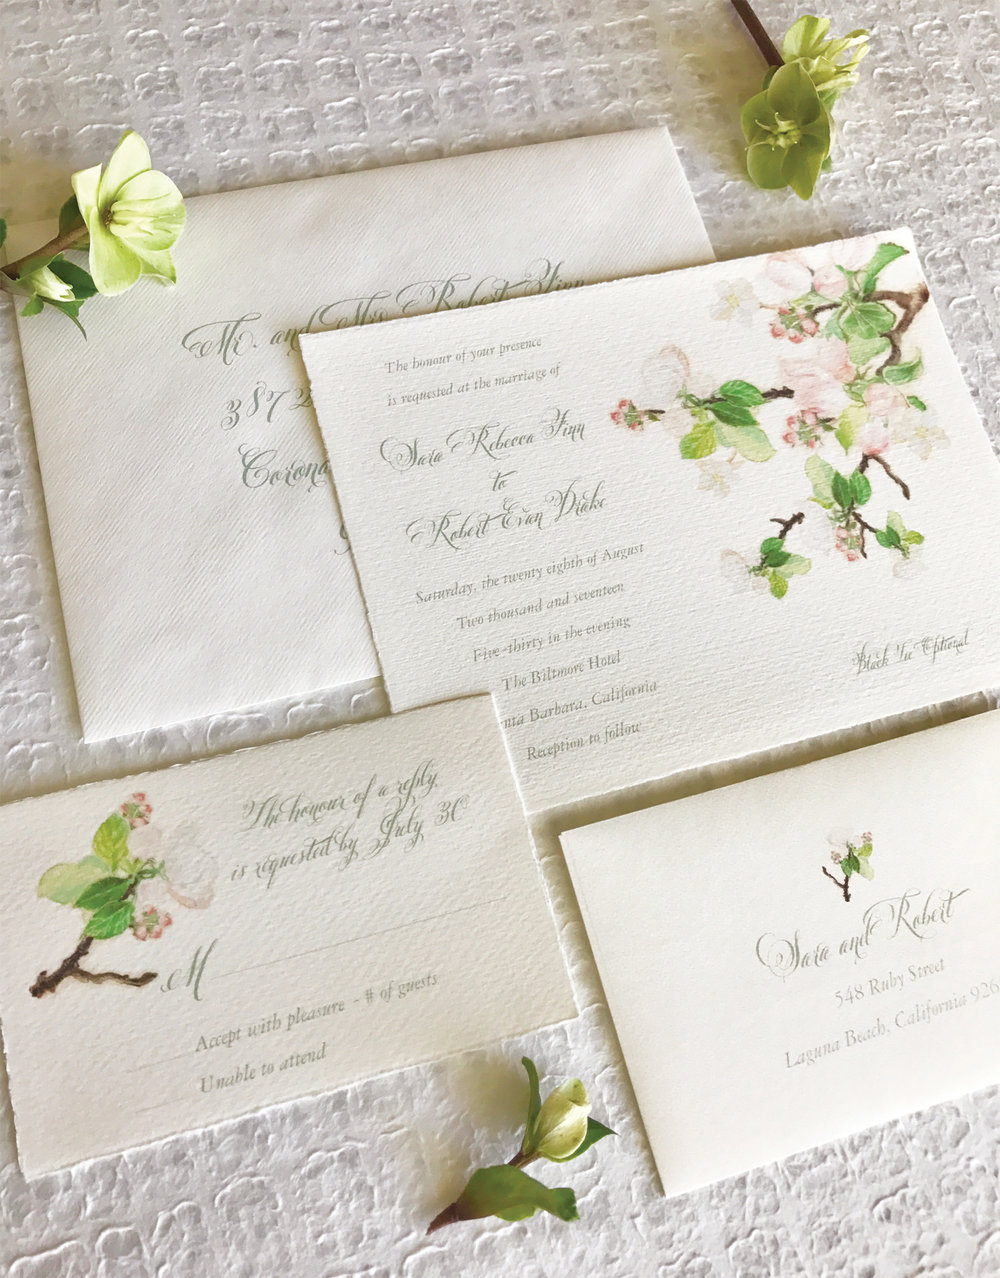 Papermelange.com | Custom Wedding Invitations | Floral Wedding Invitations  | Spring Wedding Invitations |